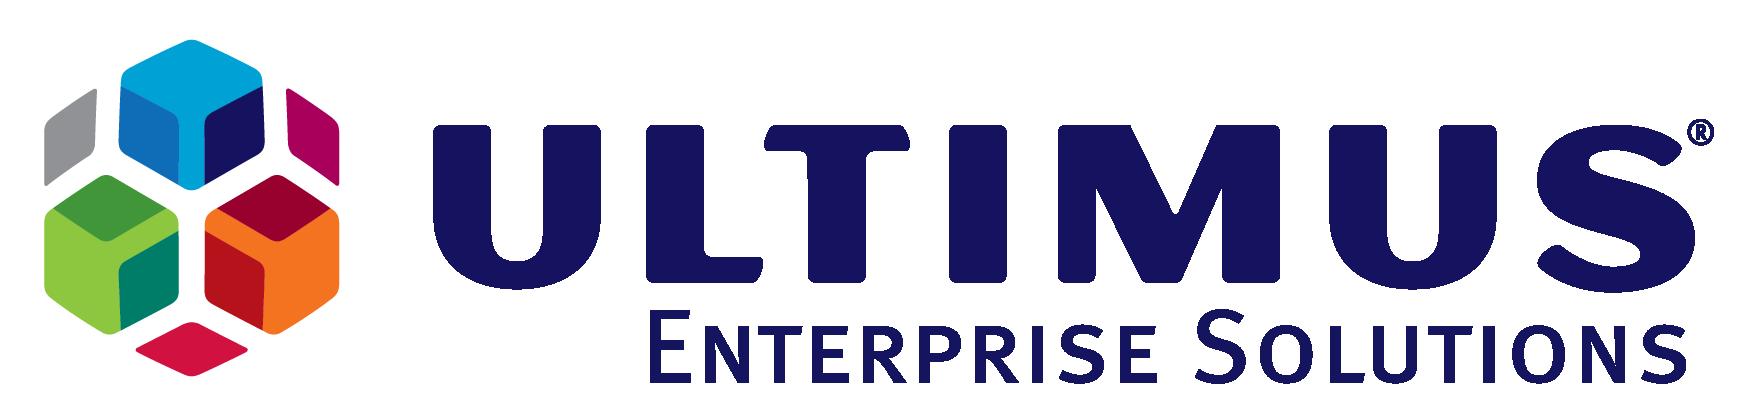 Ultimus BPM Enterprise Software Solutions